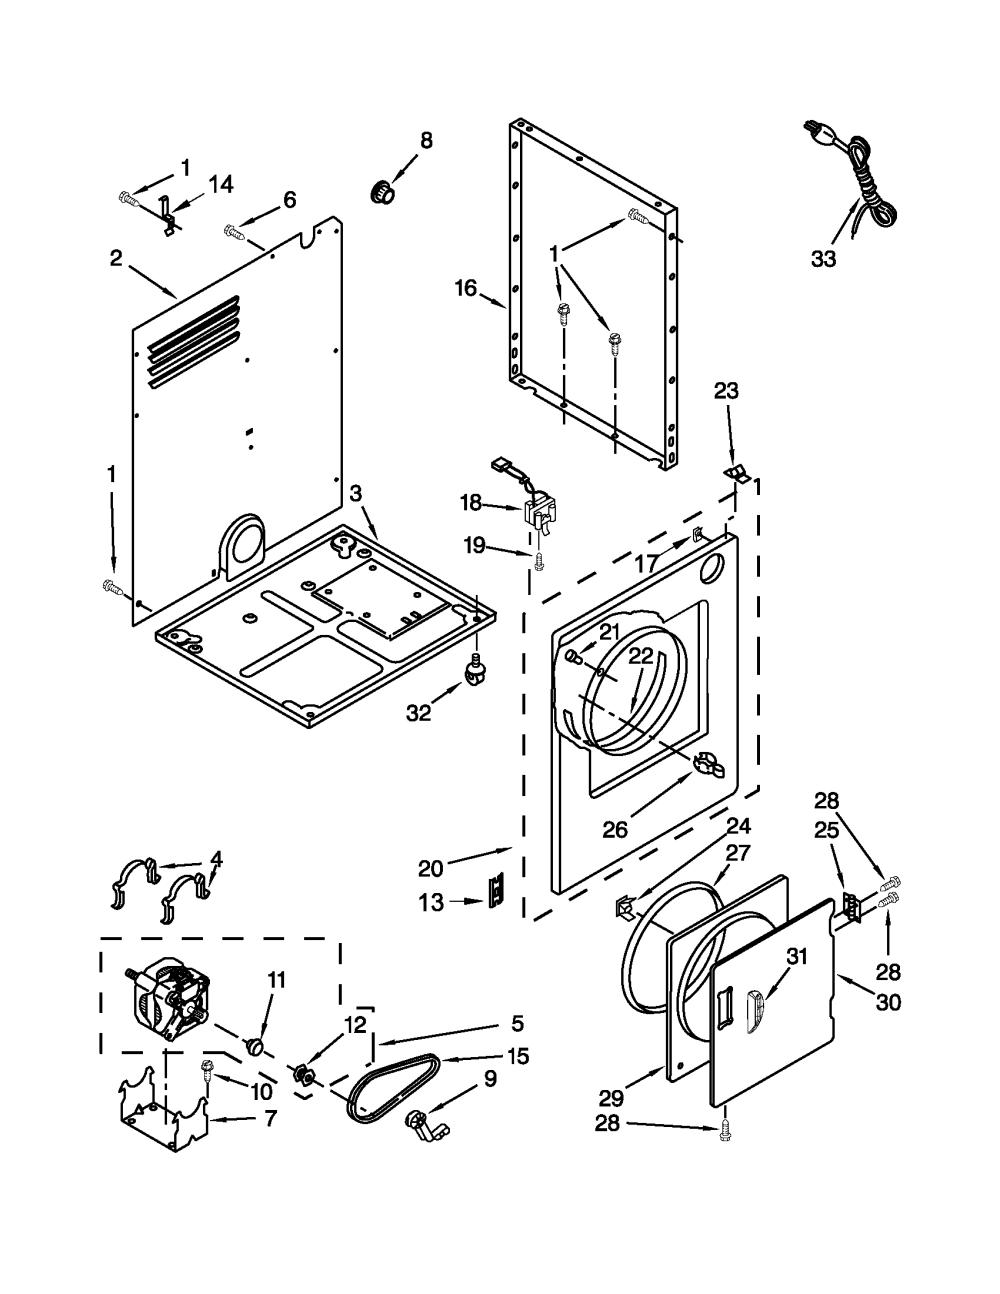 medium resolution of sears canada model 110c84722402 residential dryer genuine parts wiring diagram diagram and parts list for sears canada dryerparts